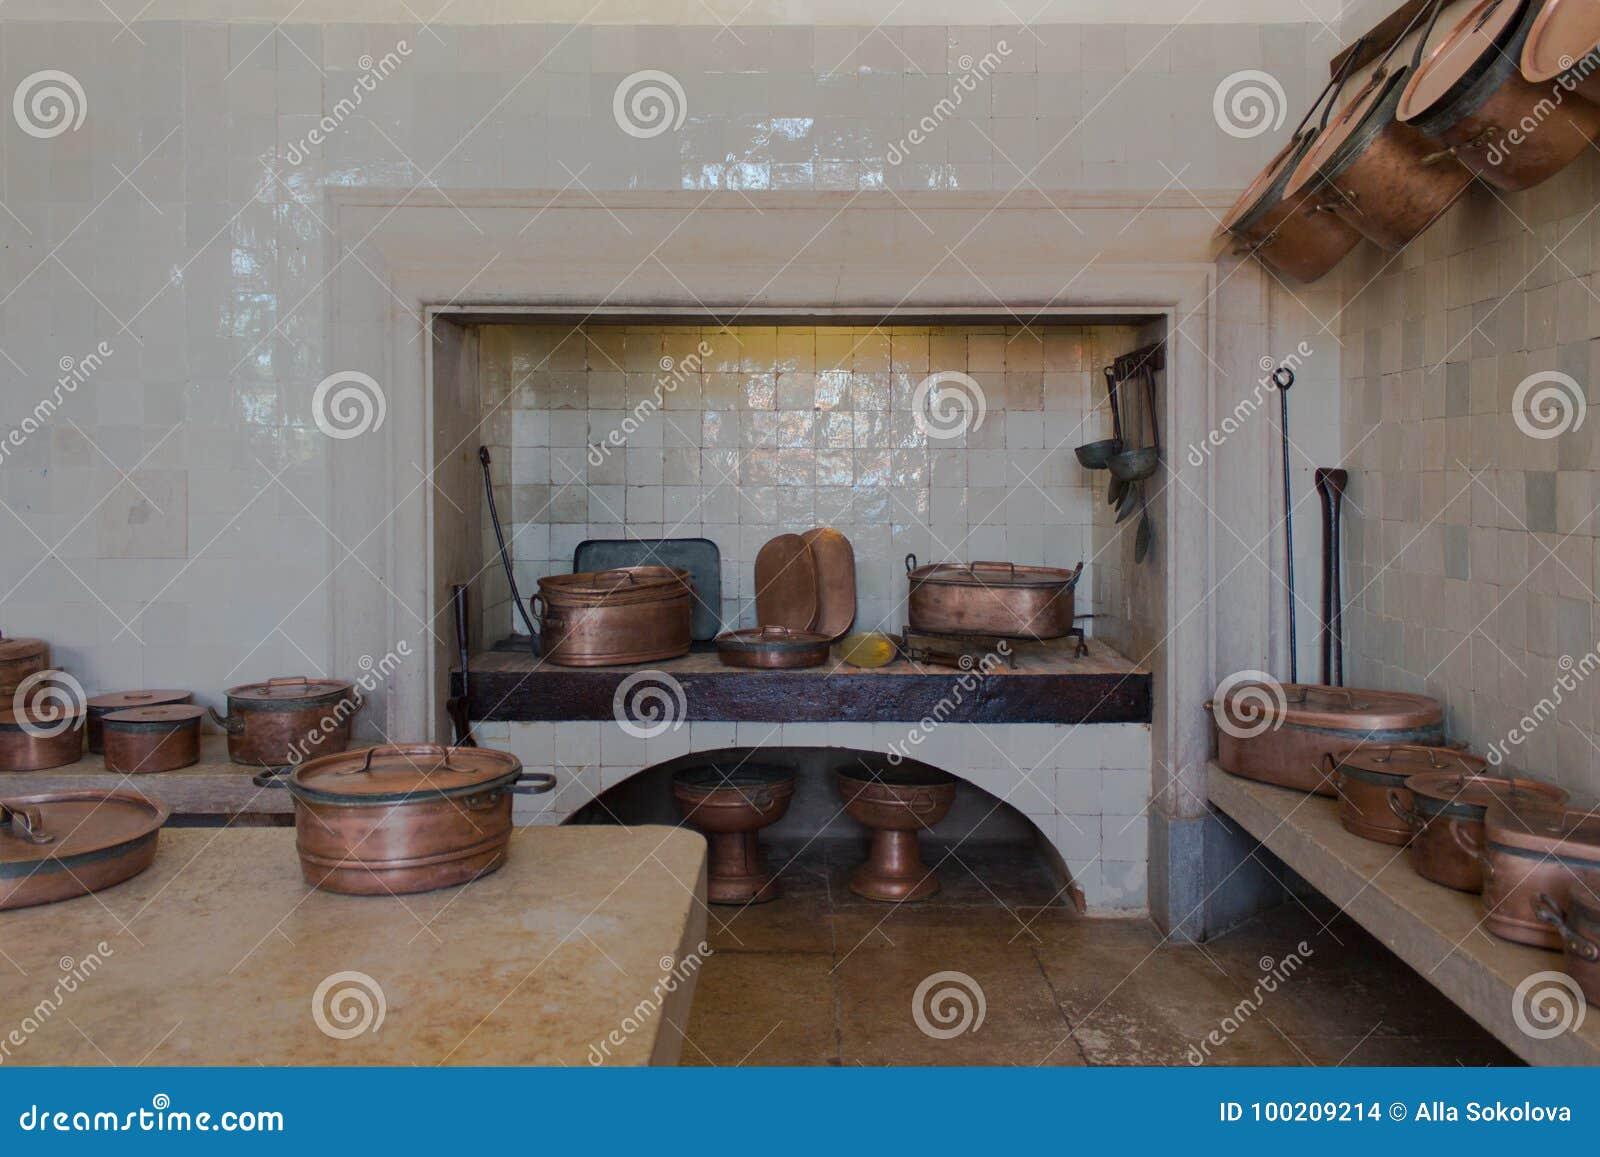 Vintage Kitchen Interior Stock Photo Image Of Ladle 100209214